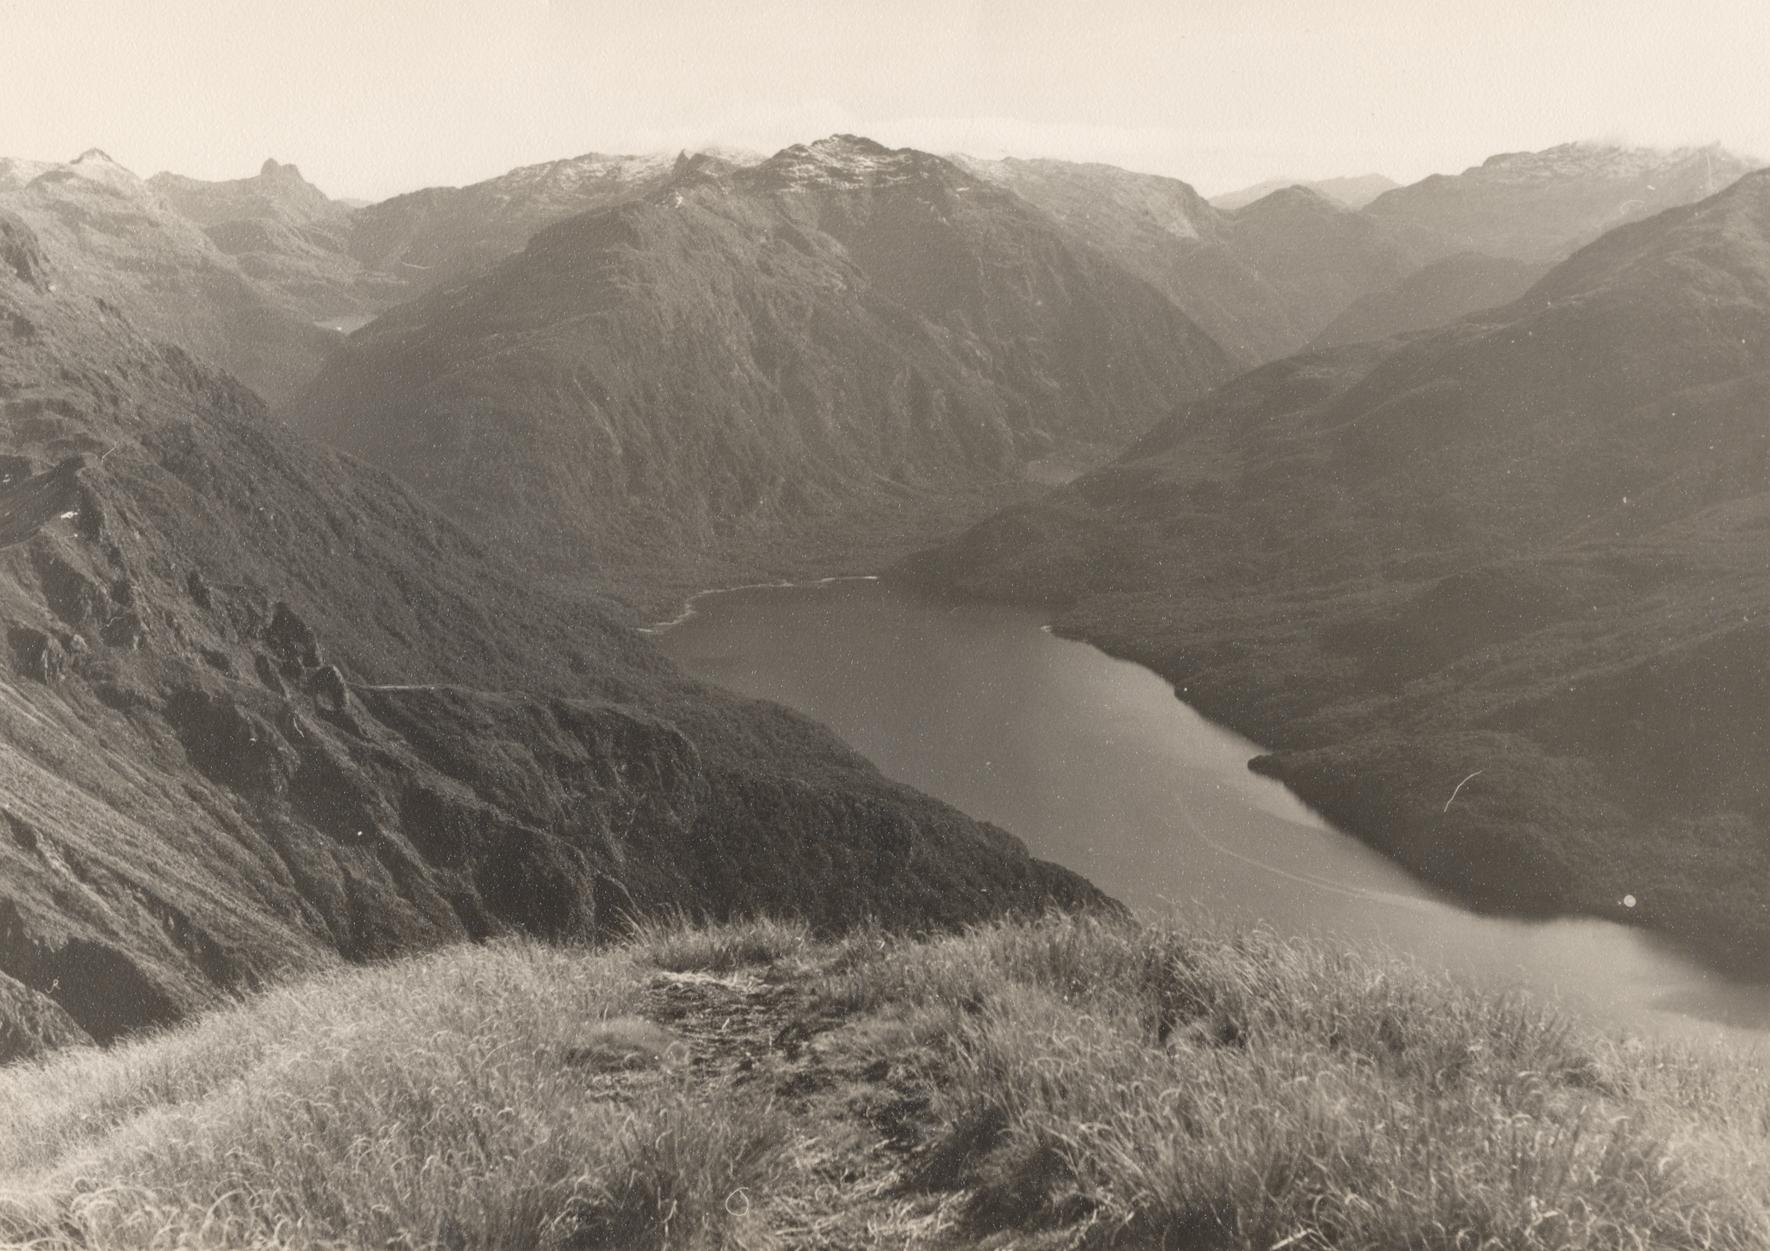 Unidentified area of Te Moana o Atawhenua, near Lake Te Anau, Aotearoa NZ. c.1948